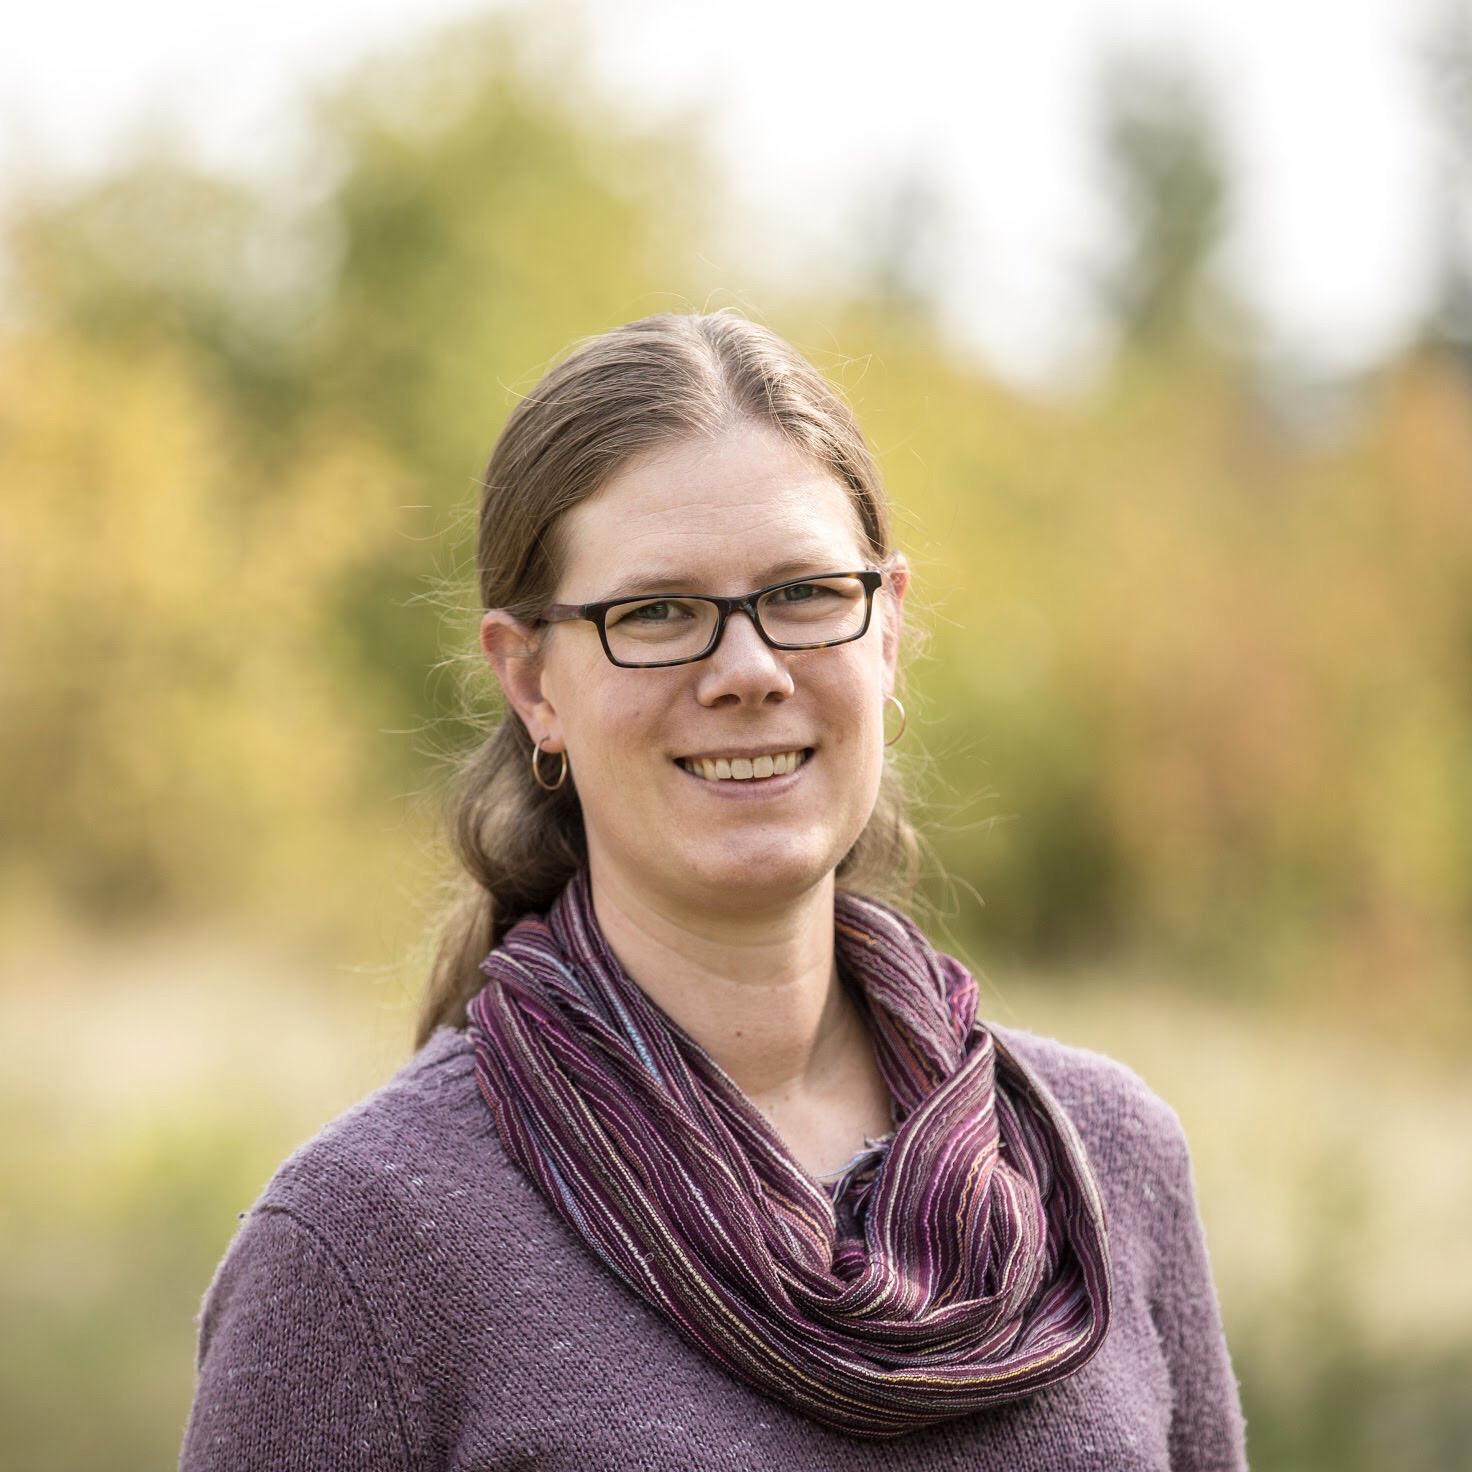 King's Economics Professor, Dr. Gerda Kits